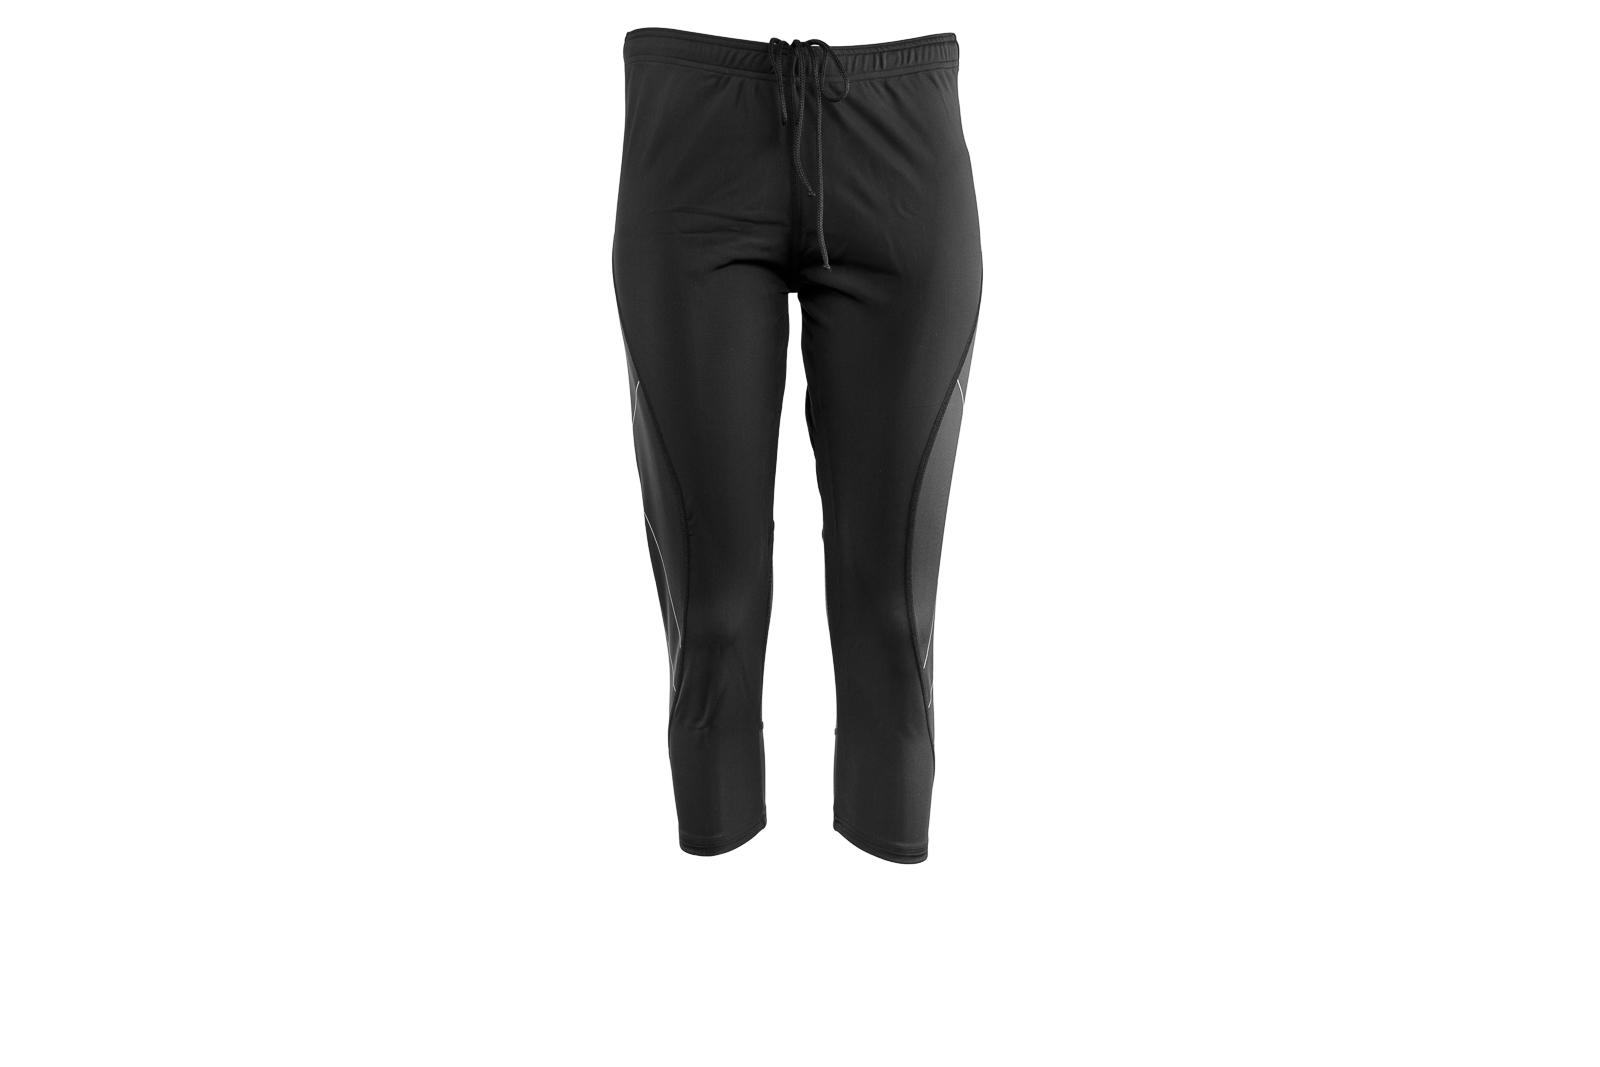 ¾ running pants